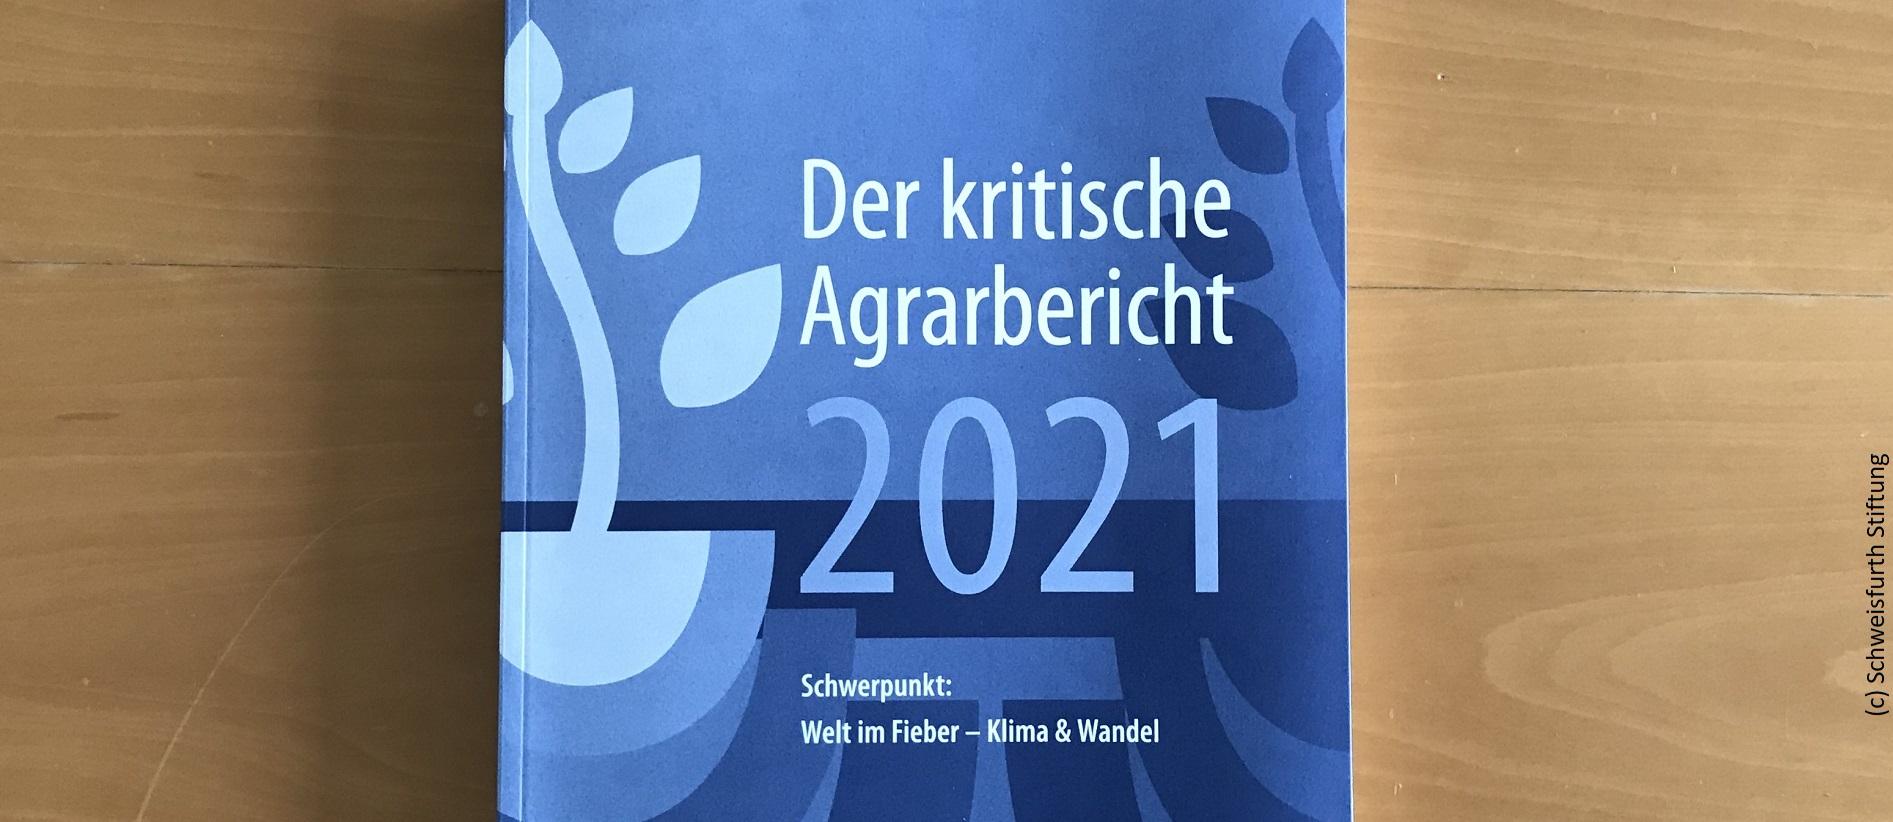 (c) Schweisfurth Stiftung